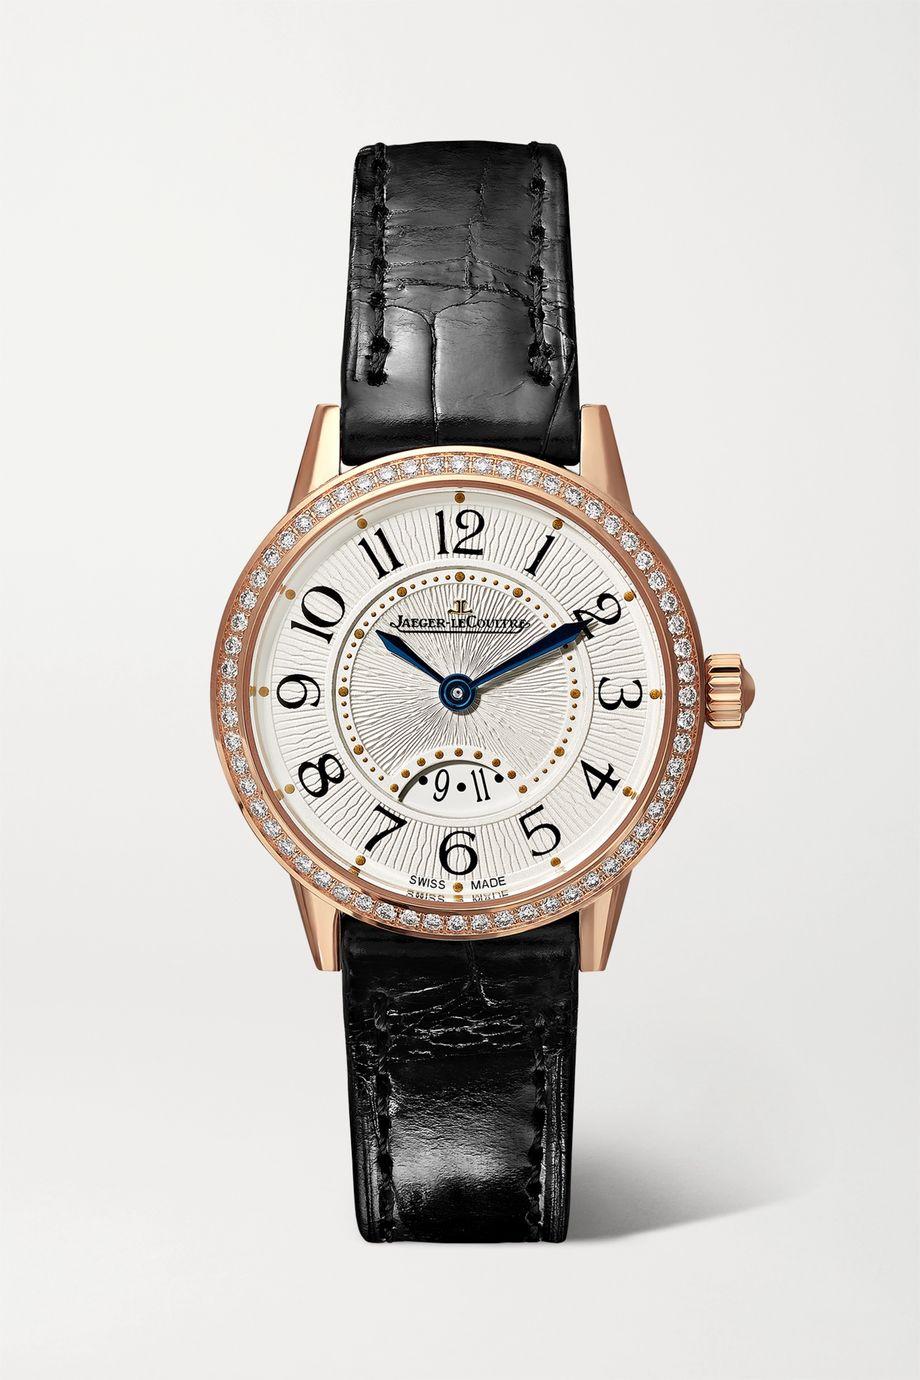 Jaeger-LeCoultre Rendez-Vous Date Small Quartz 29mm 18-karat rose gold, alligator and diamond watch